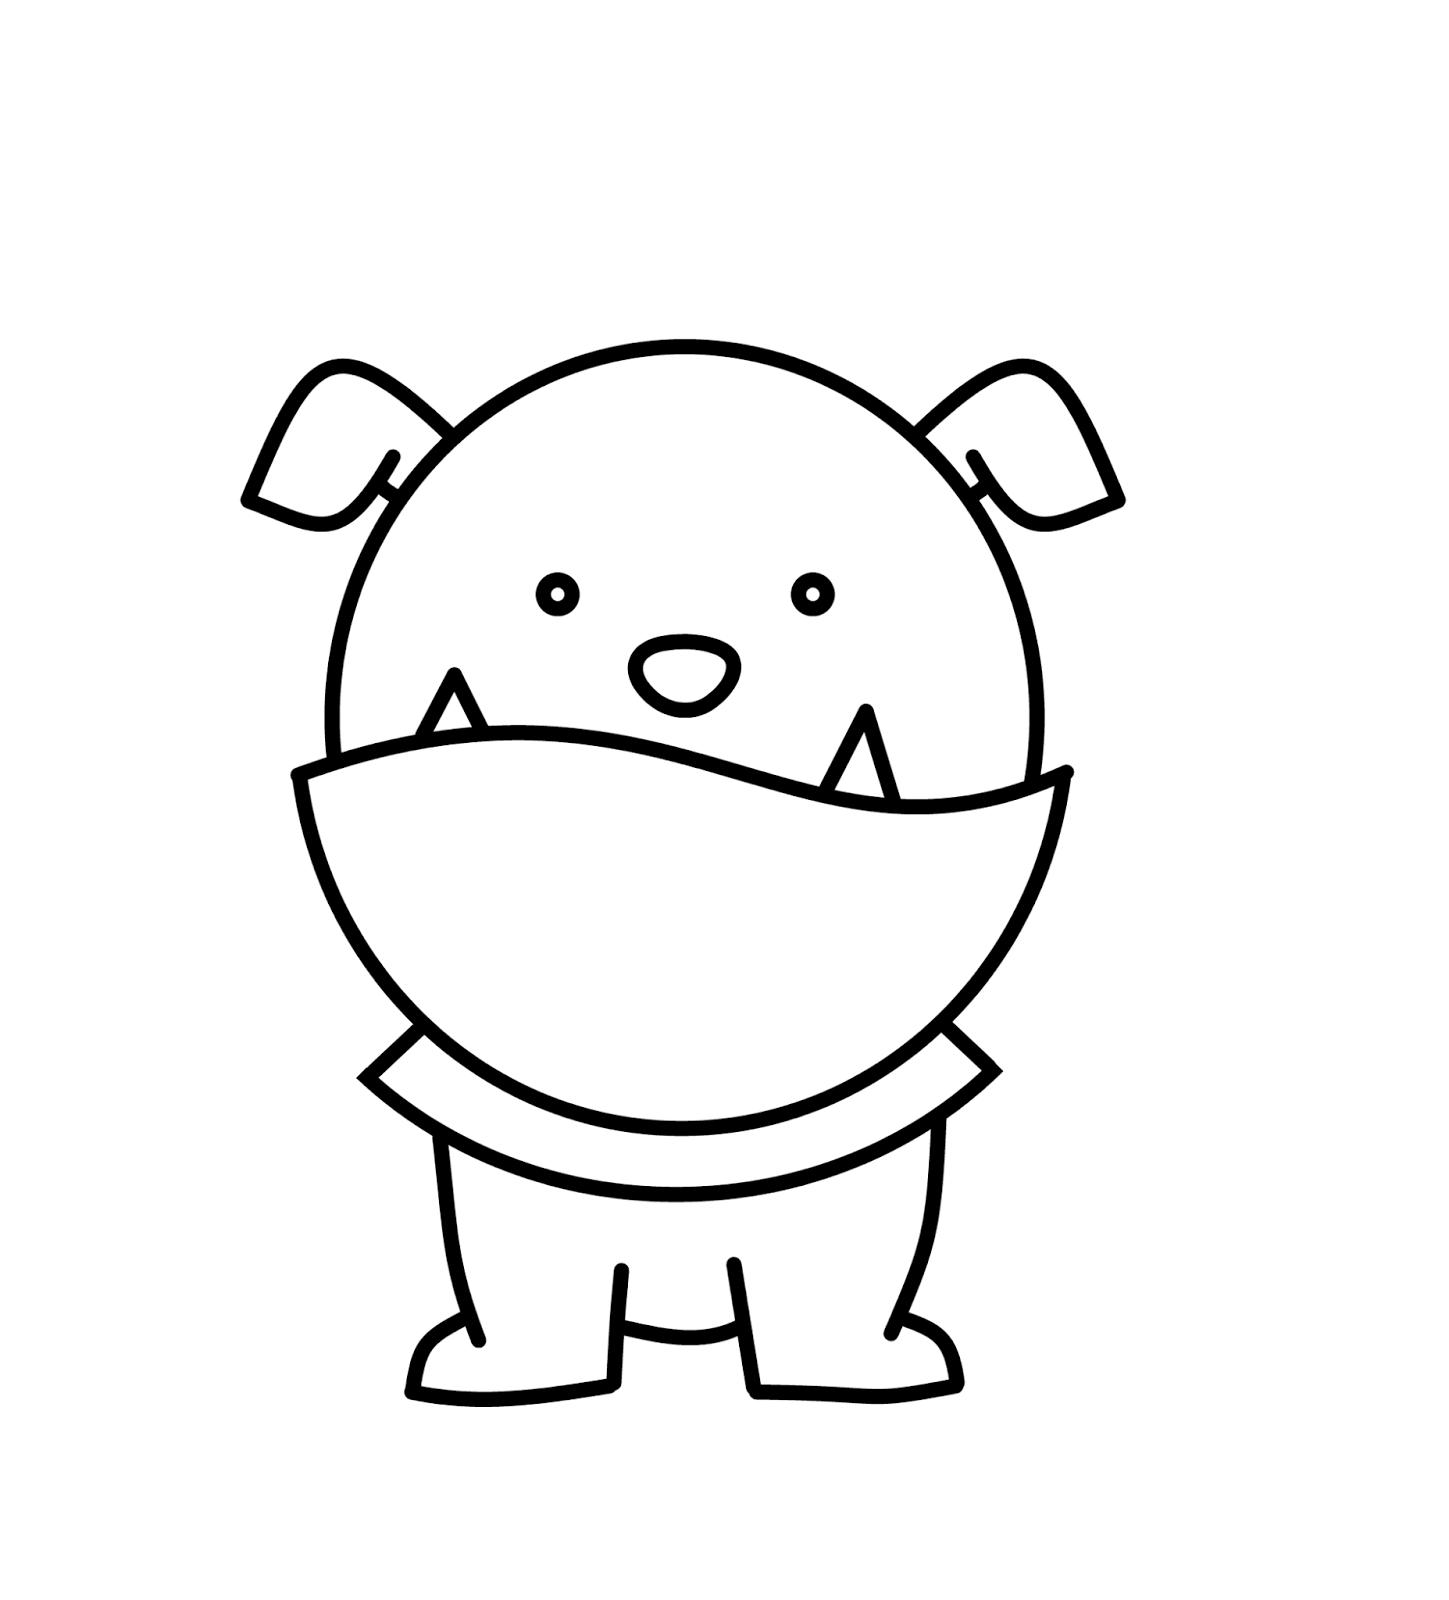 Easy Drawings Of Bulldogs